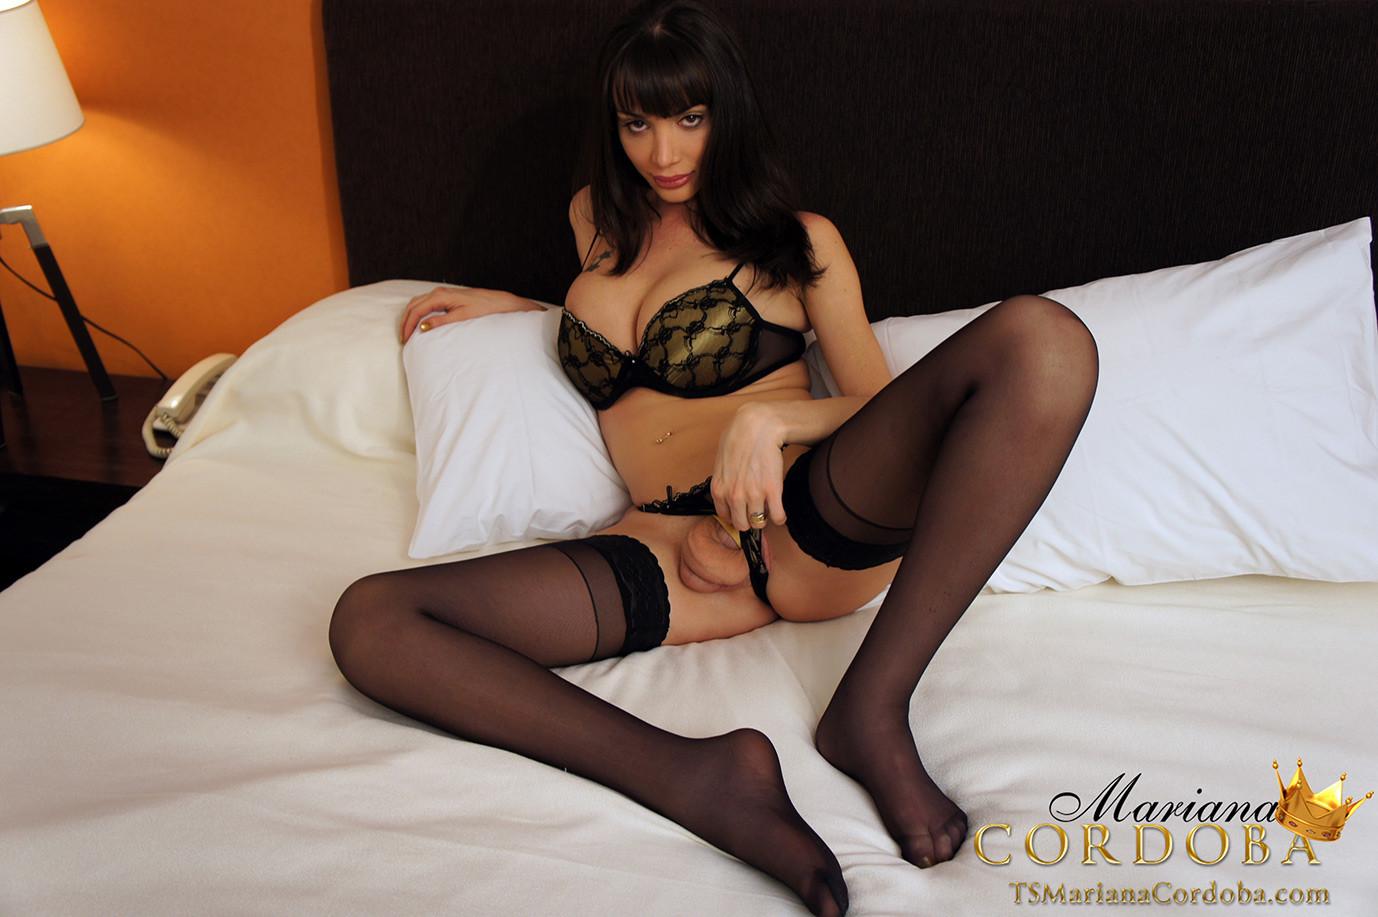 Mariana Cordoba - Транссексуал - Галерея № 3314788